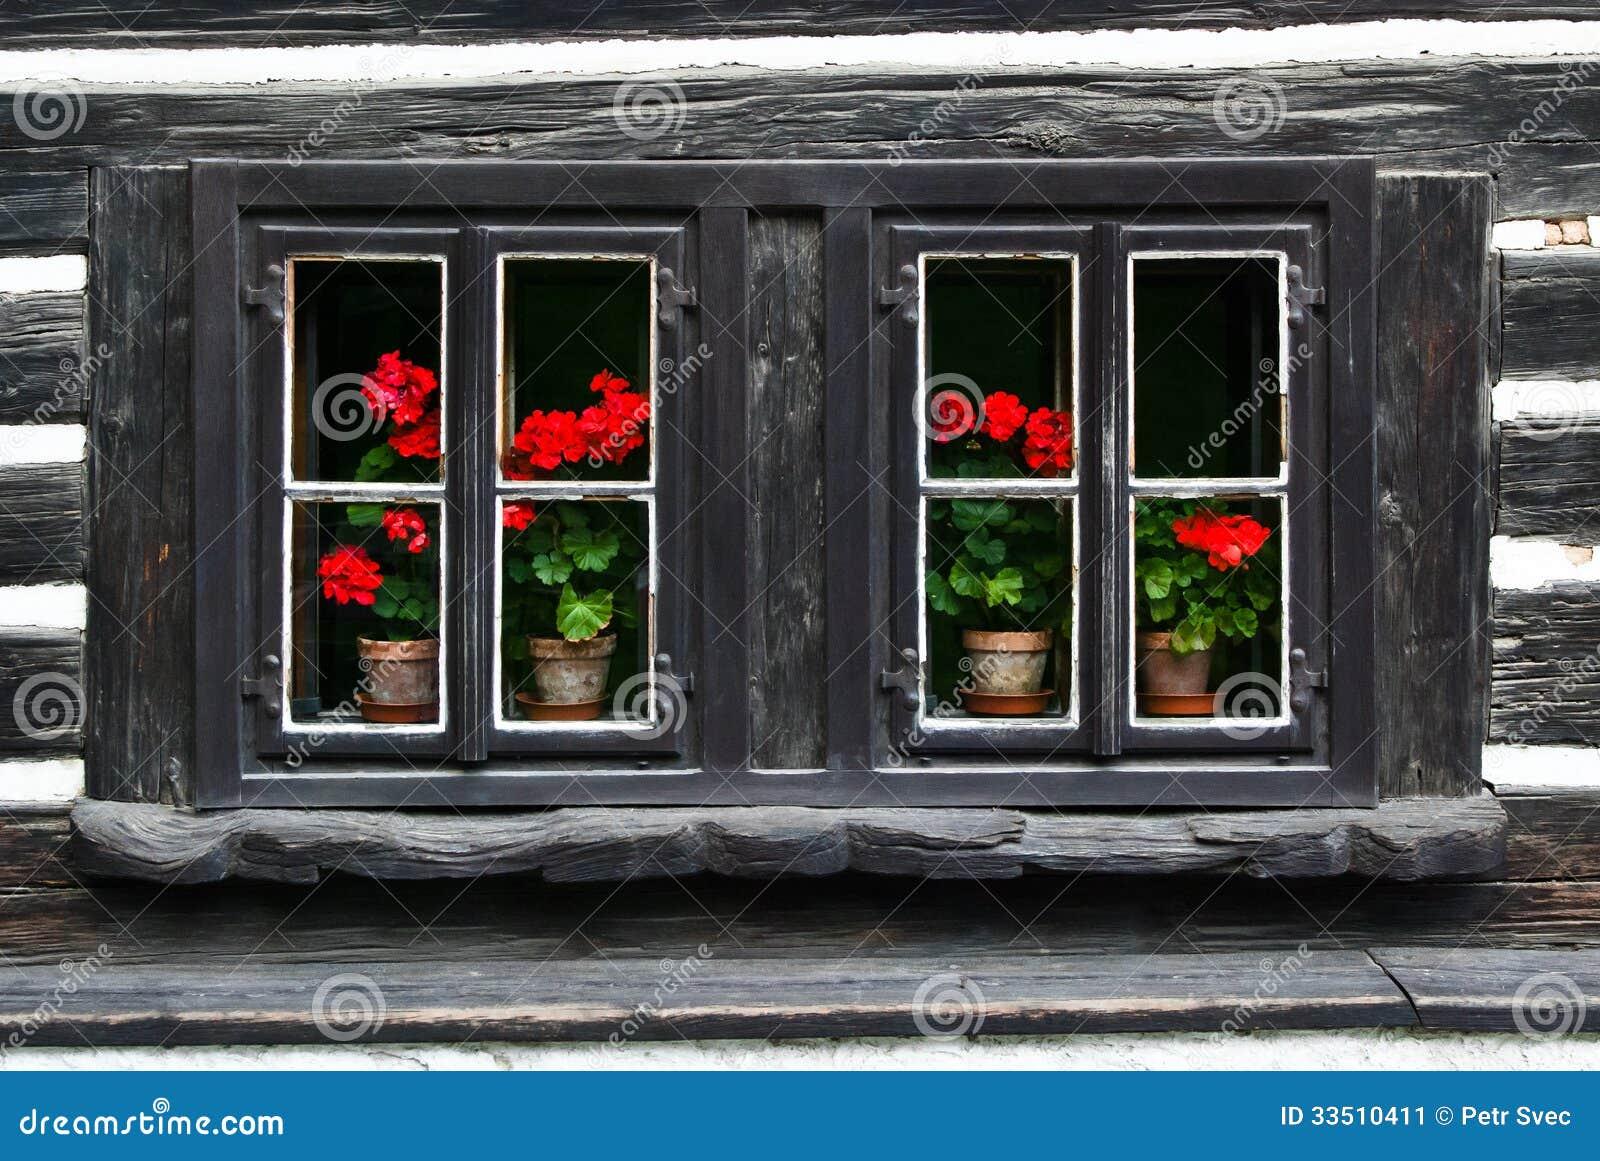 vieilles fen tres en bois image stock image 33510411. Black Bedroom Furniture Sets. Home Design Ideas